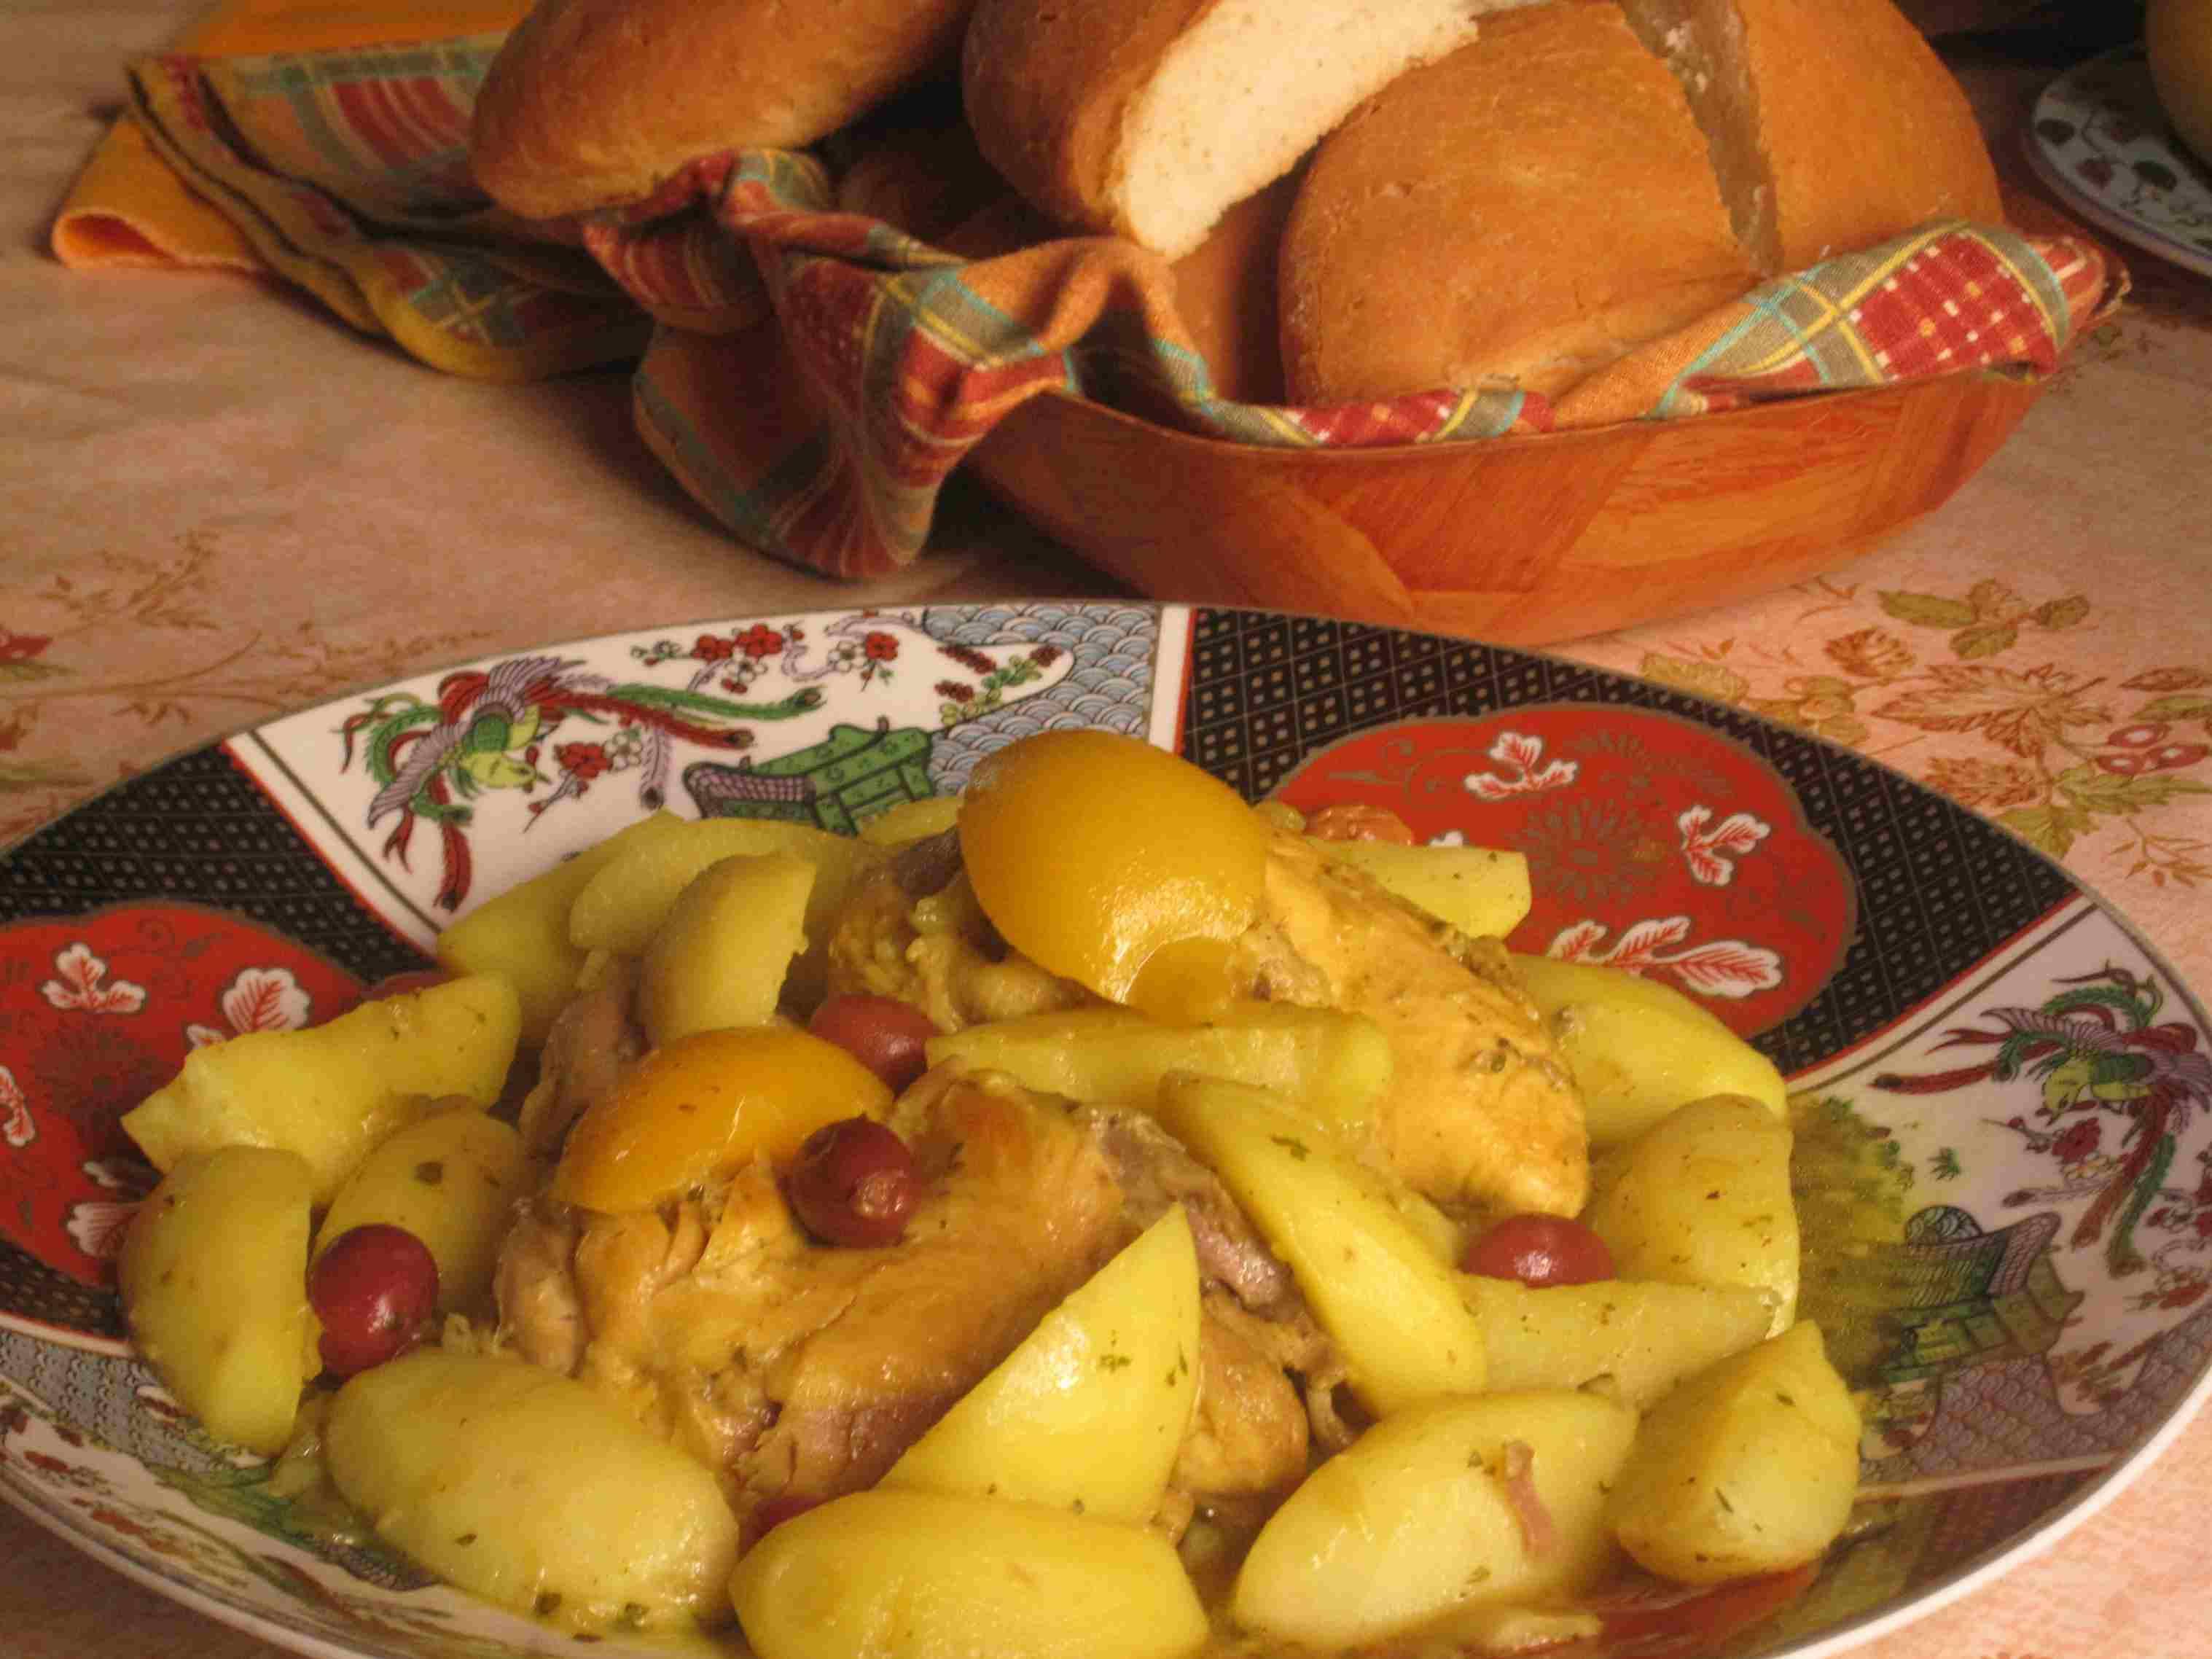 chicken-potatoes-olives-3035-x-2276.jpg